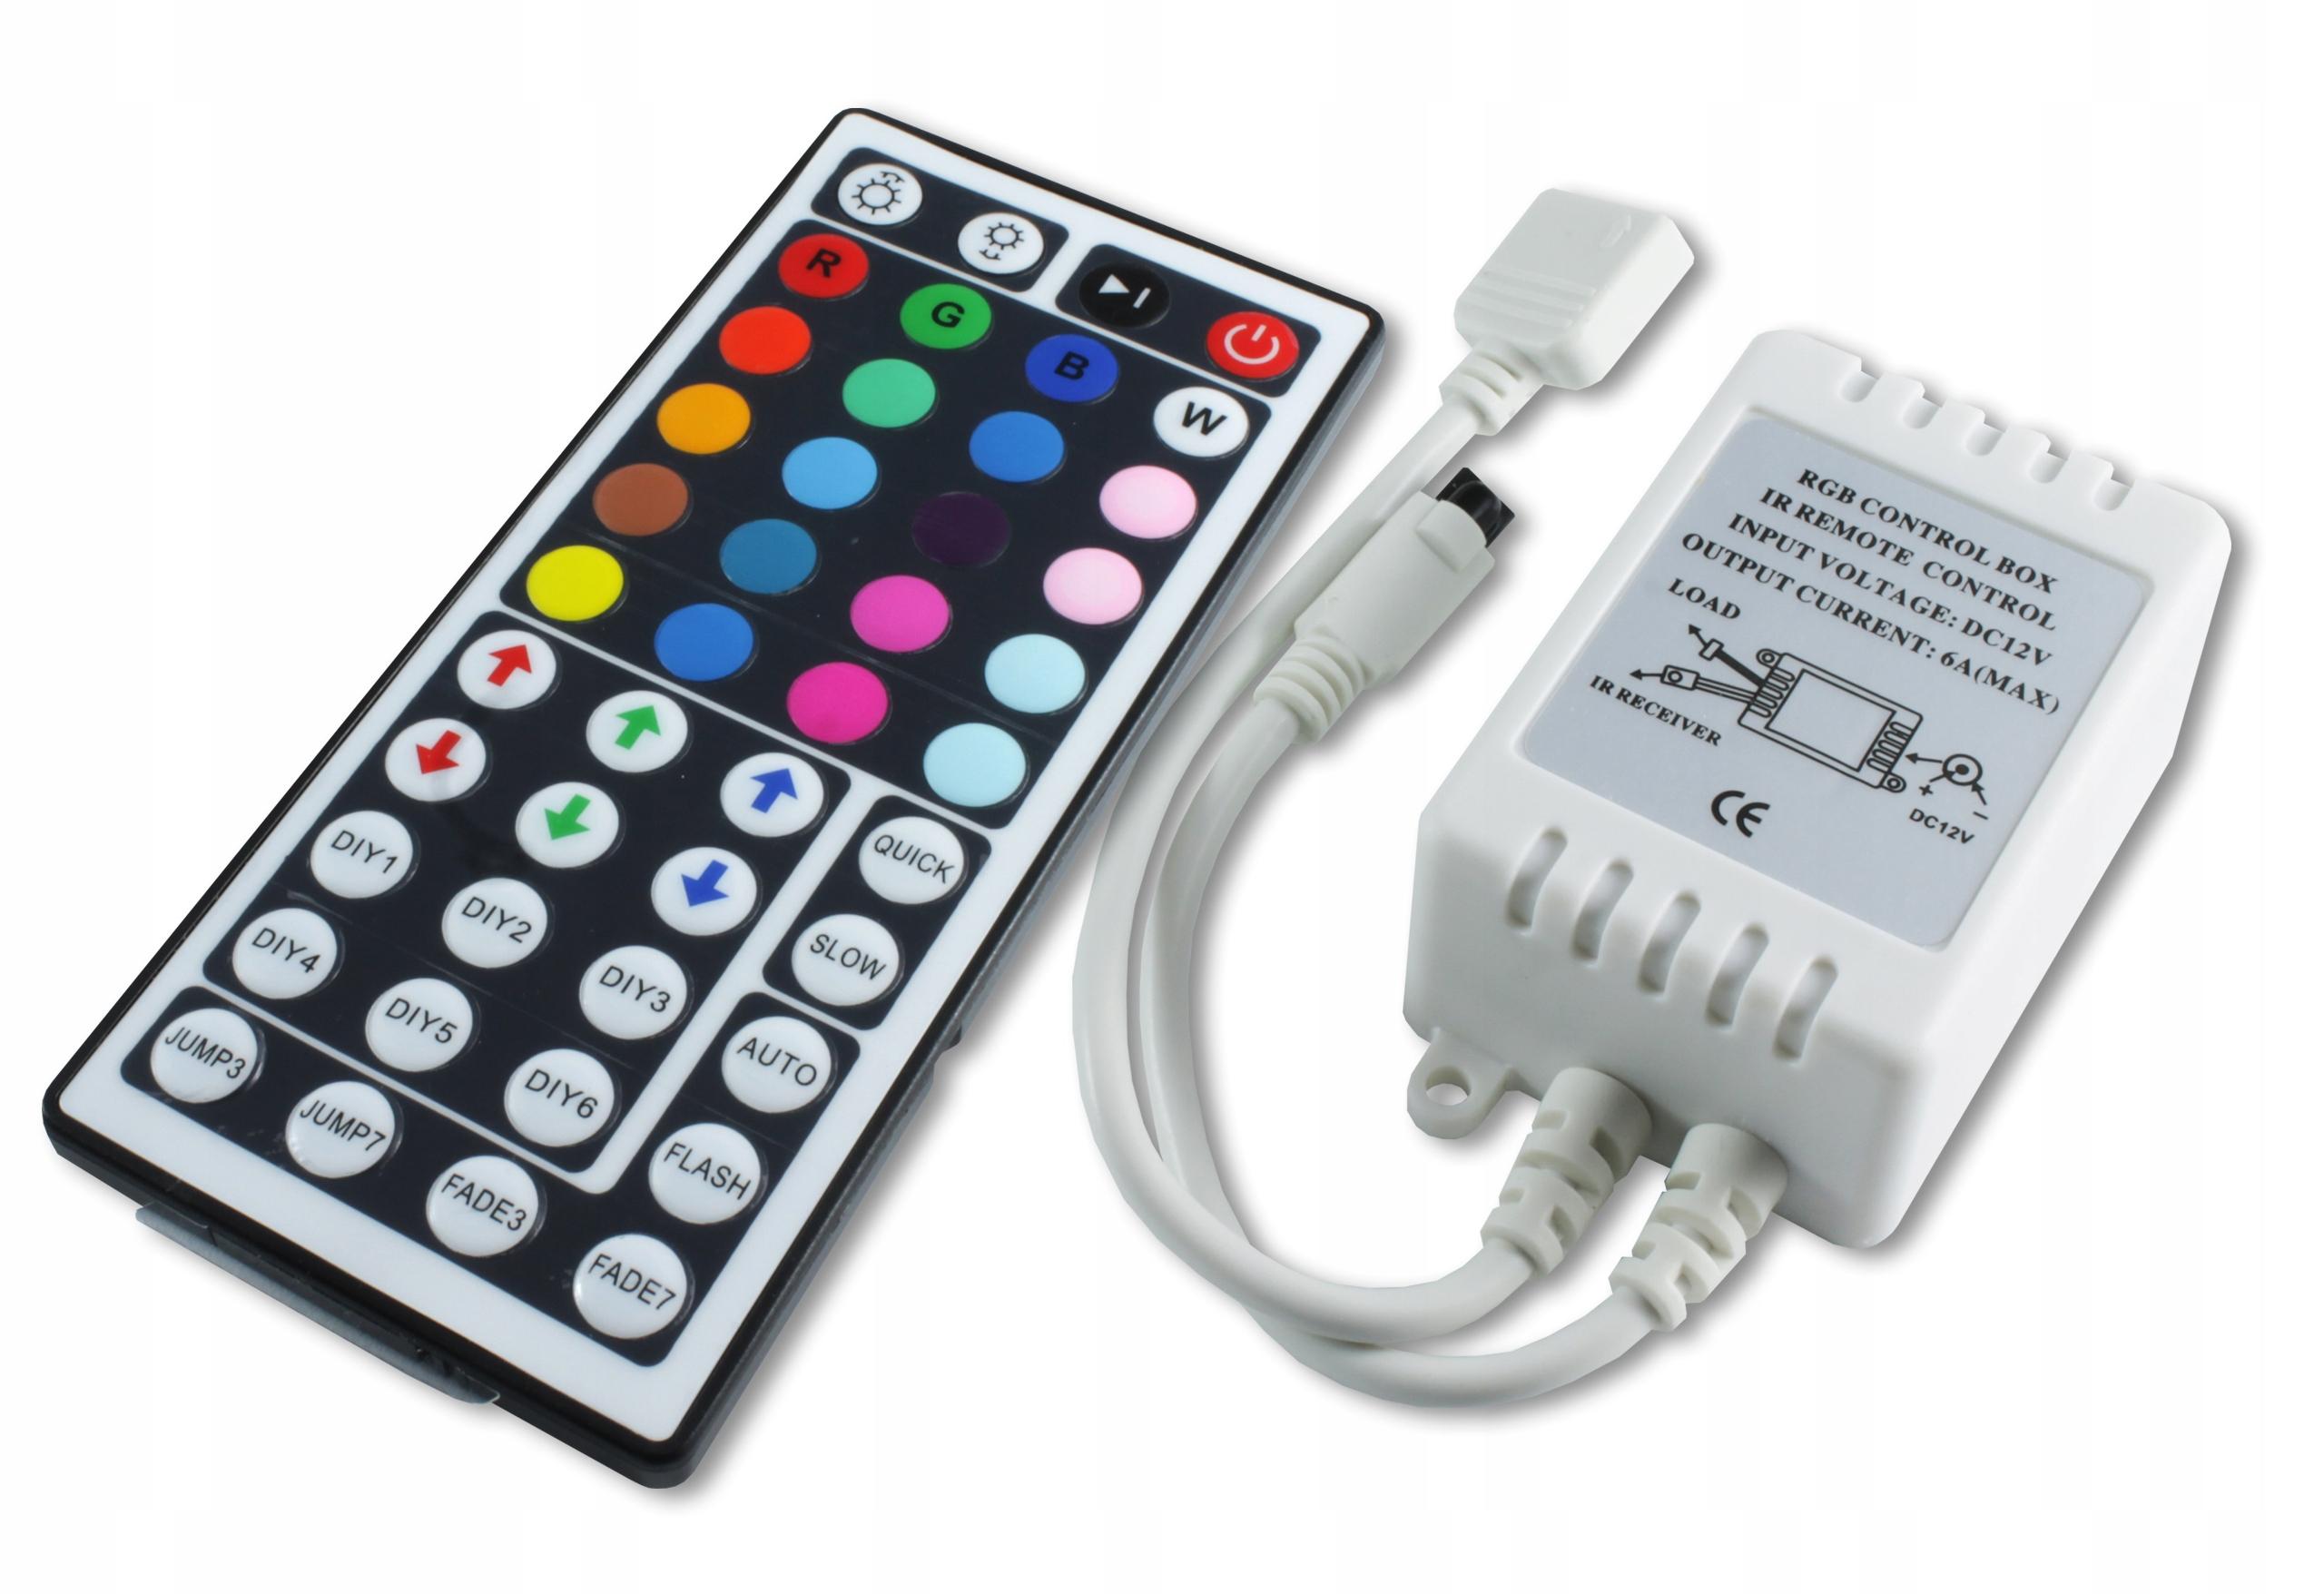 Sterownik Kontroler RGB PILOT do taśm LED IR 12V